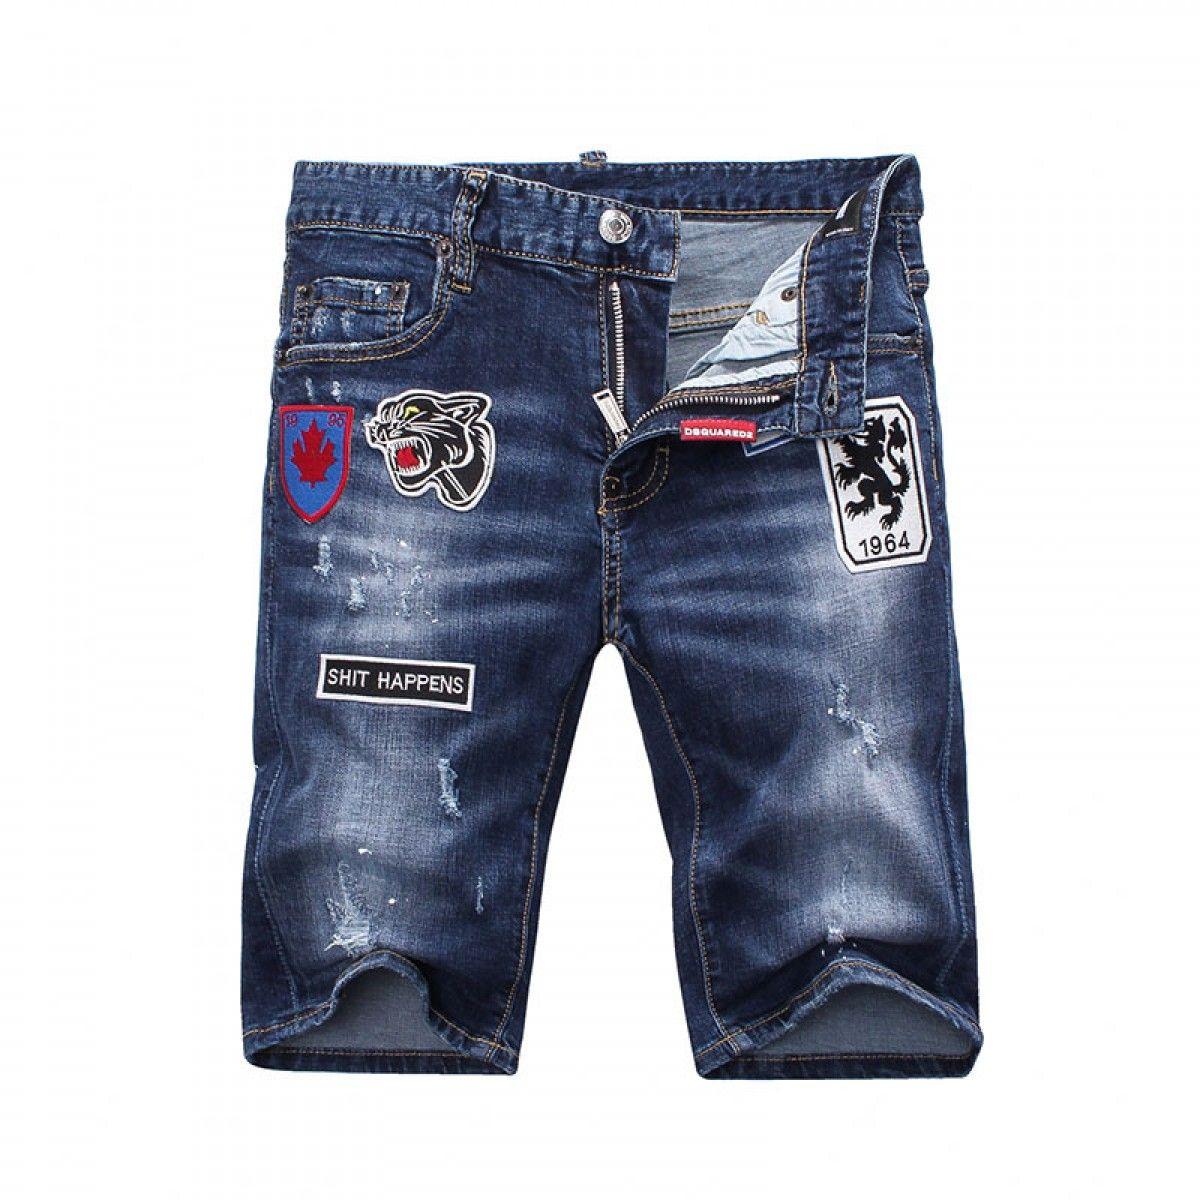 Dsquared2 SS2018 Mens Short Jeans Tiger Badge Navy Blue ... 62f598d8dc40